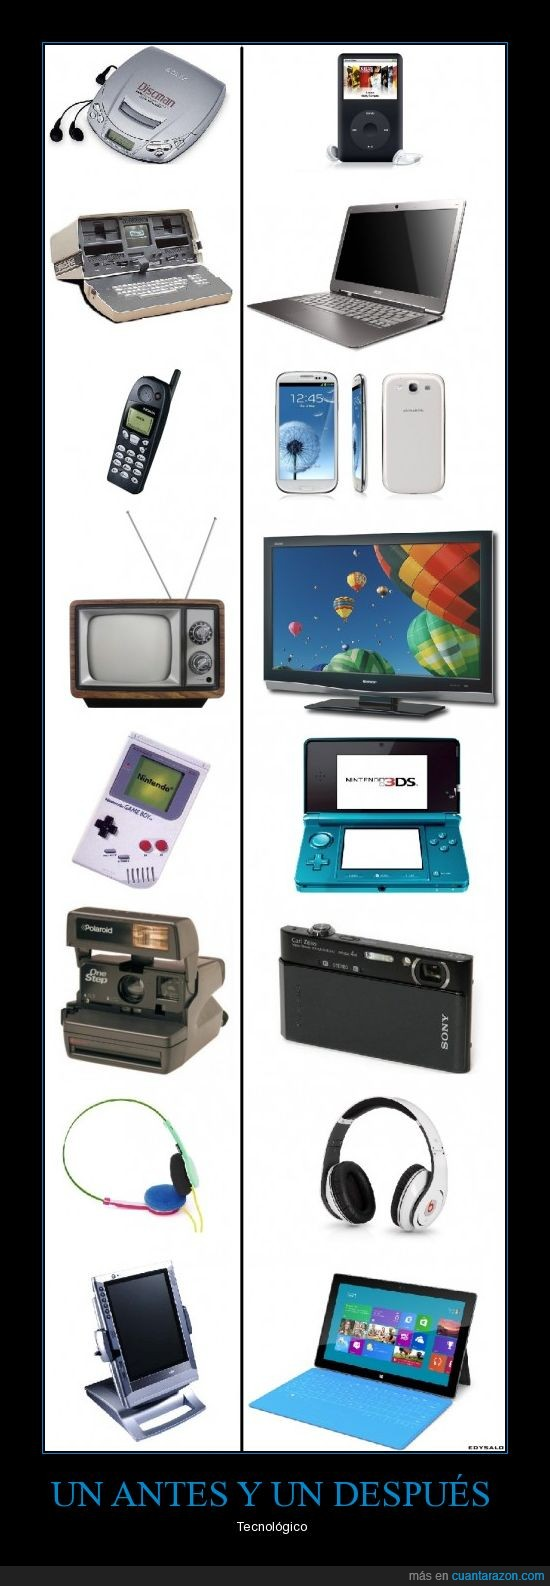 antes,apple,audifonos,camara,despues,digital,galaxy,ipod,laptop,mac,mp3,nokia,pc,sansumg,tablet,tecnologia,tv,windows